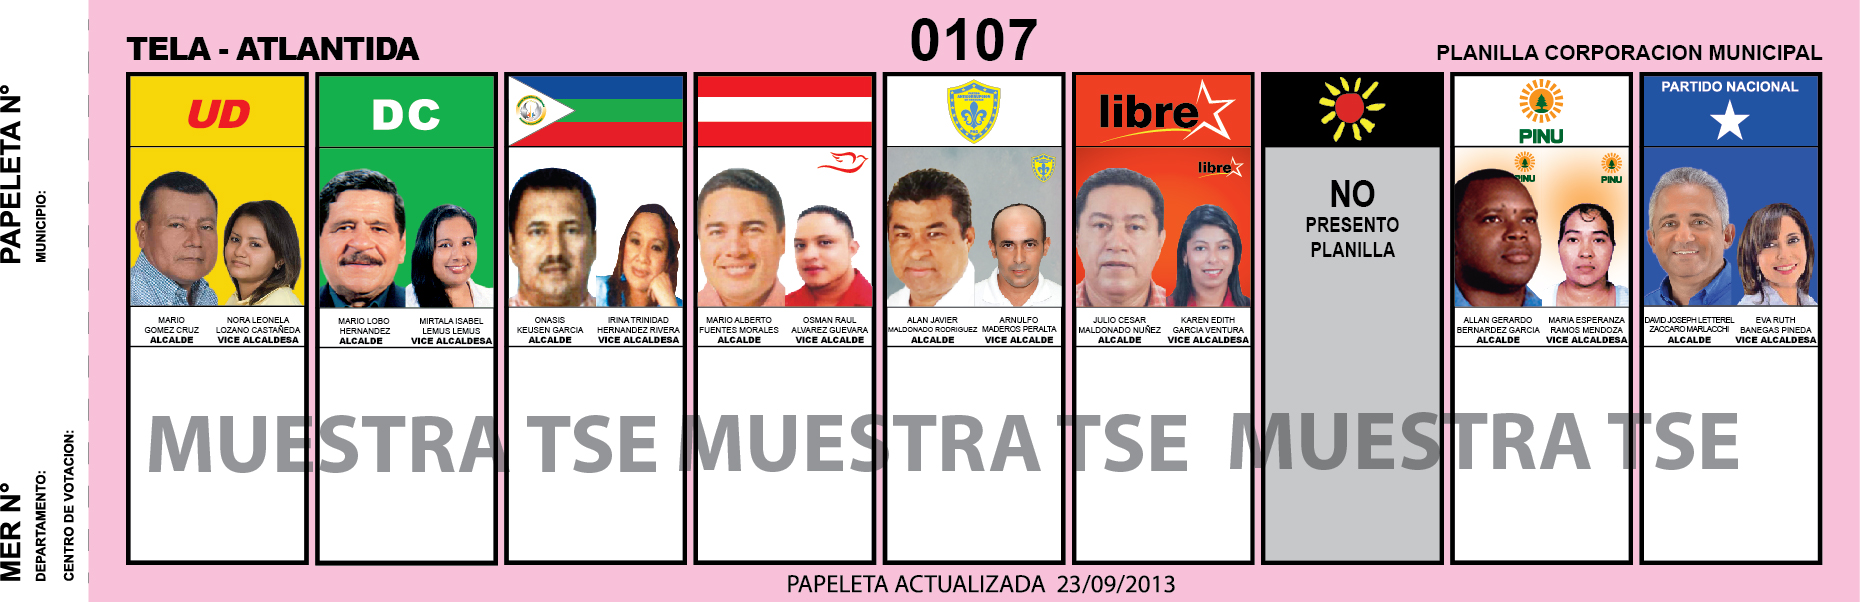 CANDIDATOS 2013 MUNICIPIO TELA - ATLANTIDA - HONDURAS